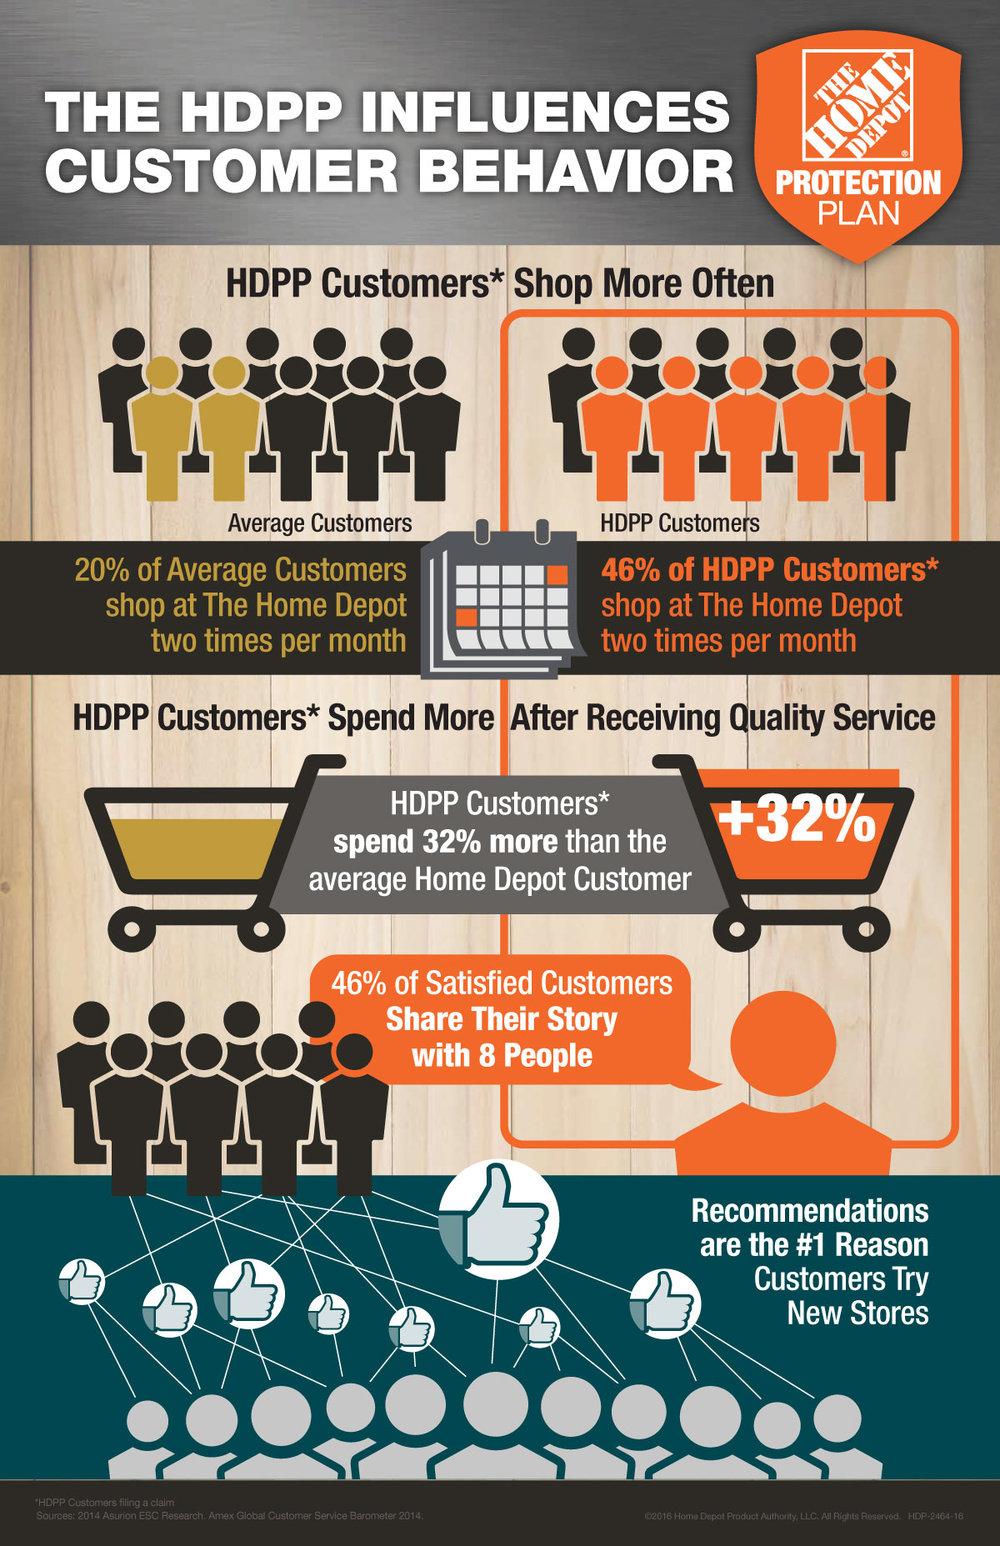 HDP-2464_Infographic_1.jpg